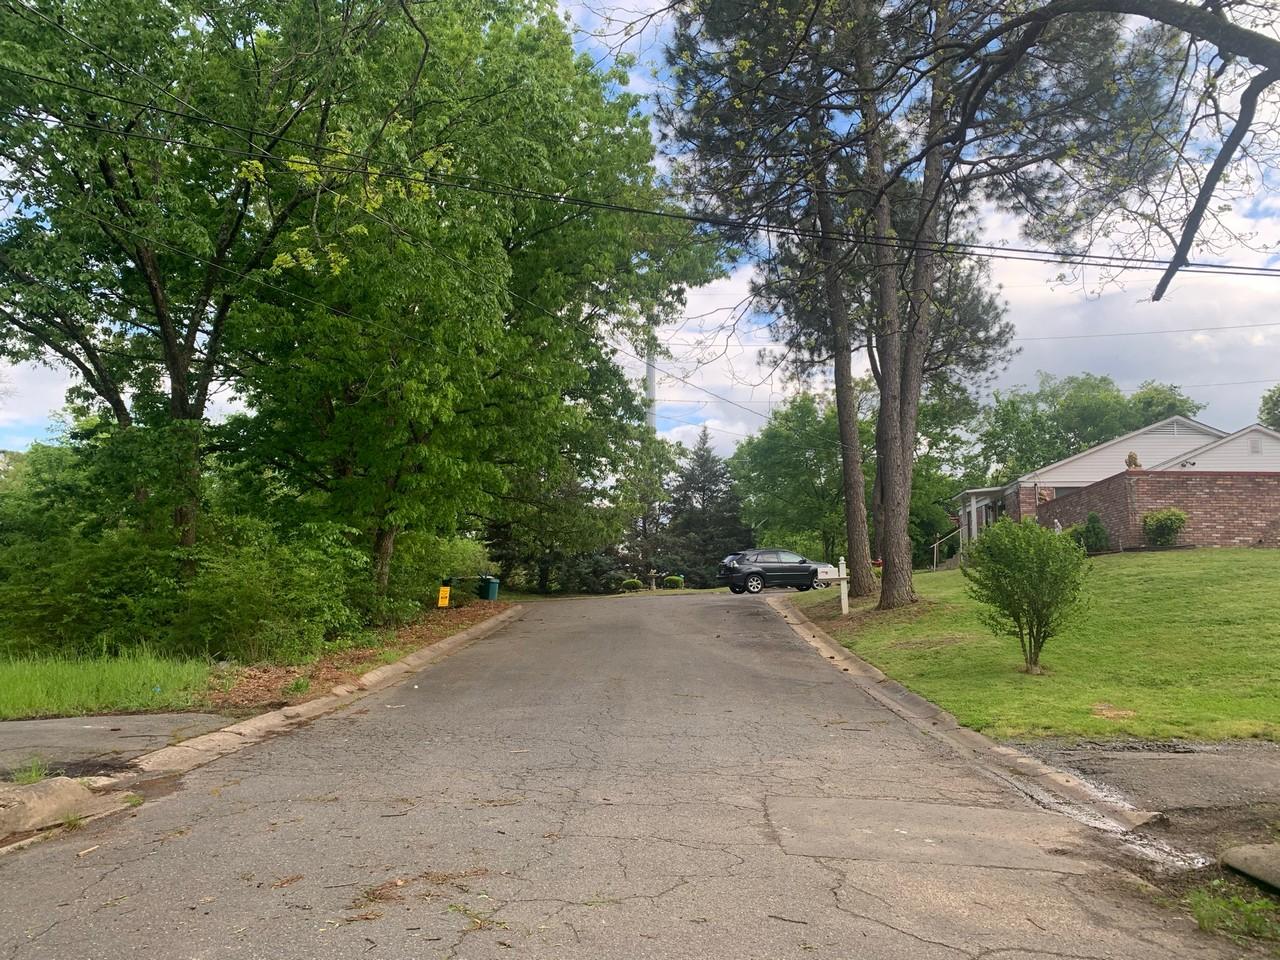 0 Phyllis St, North Little Rock, AR 72114